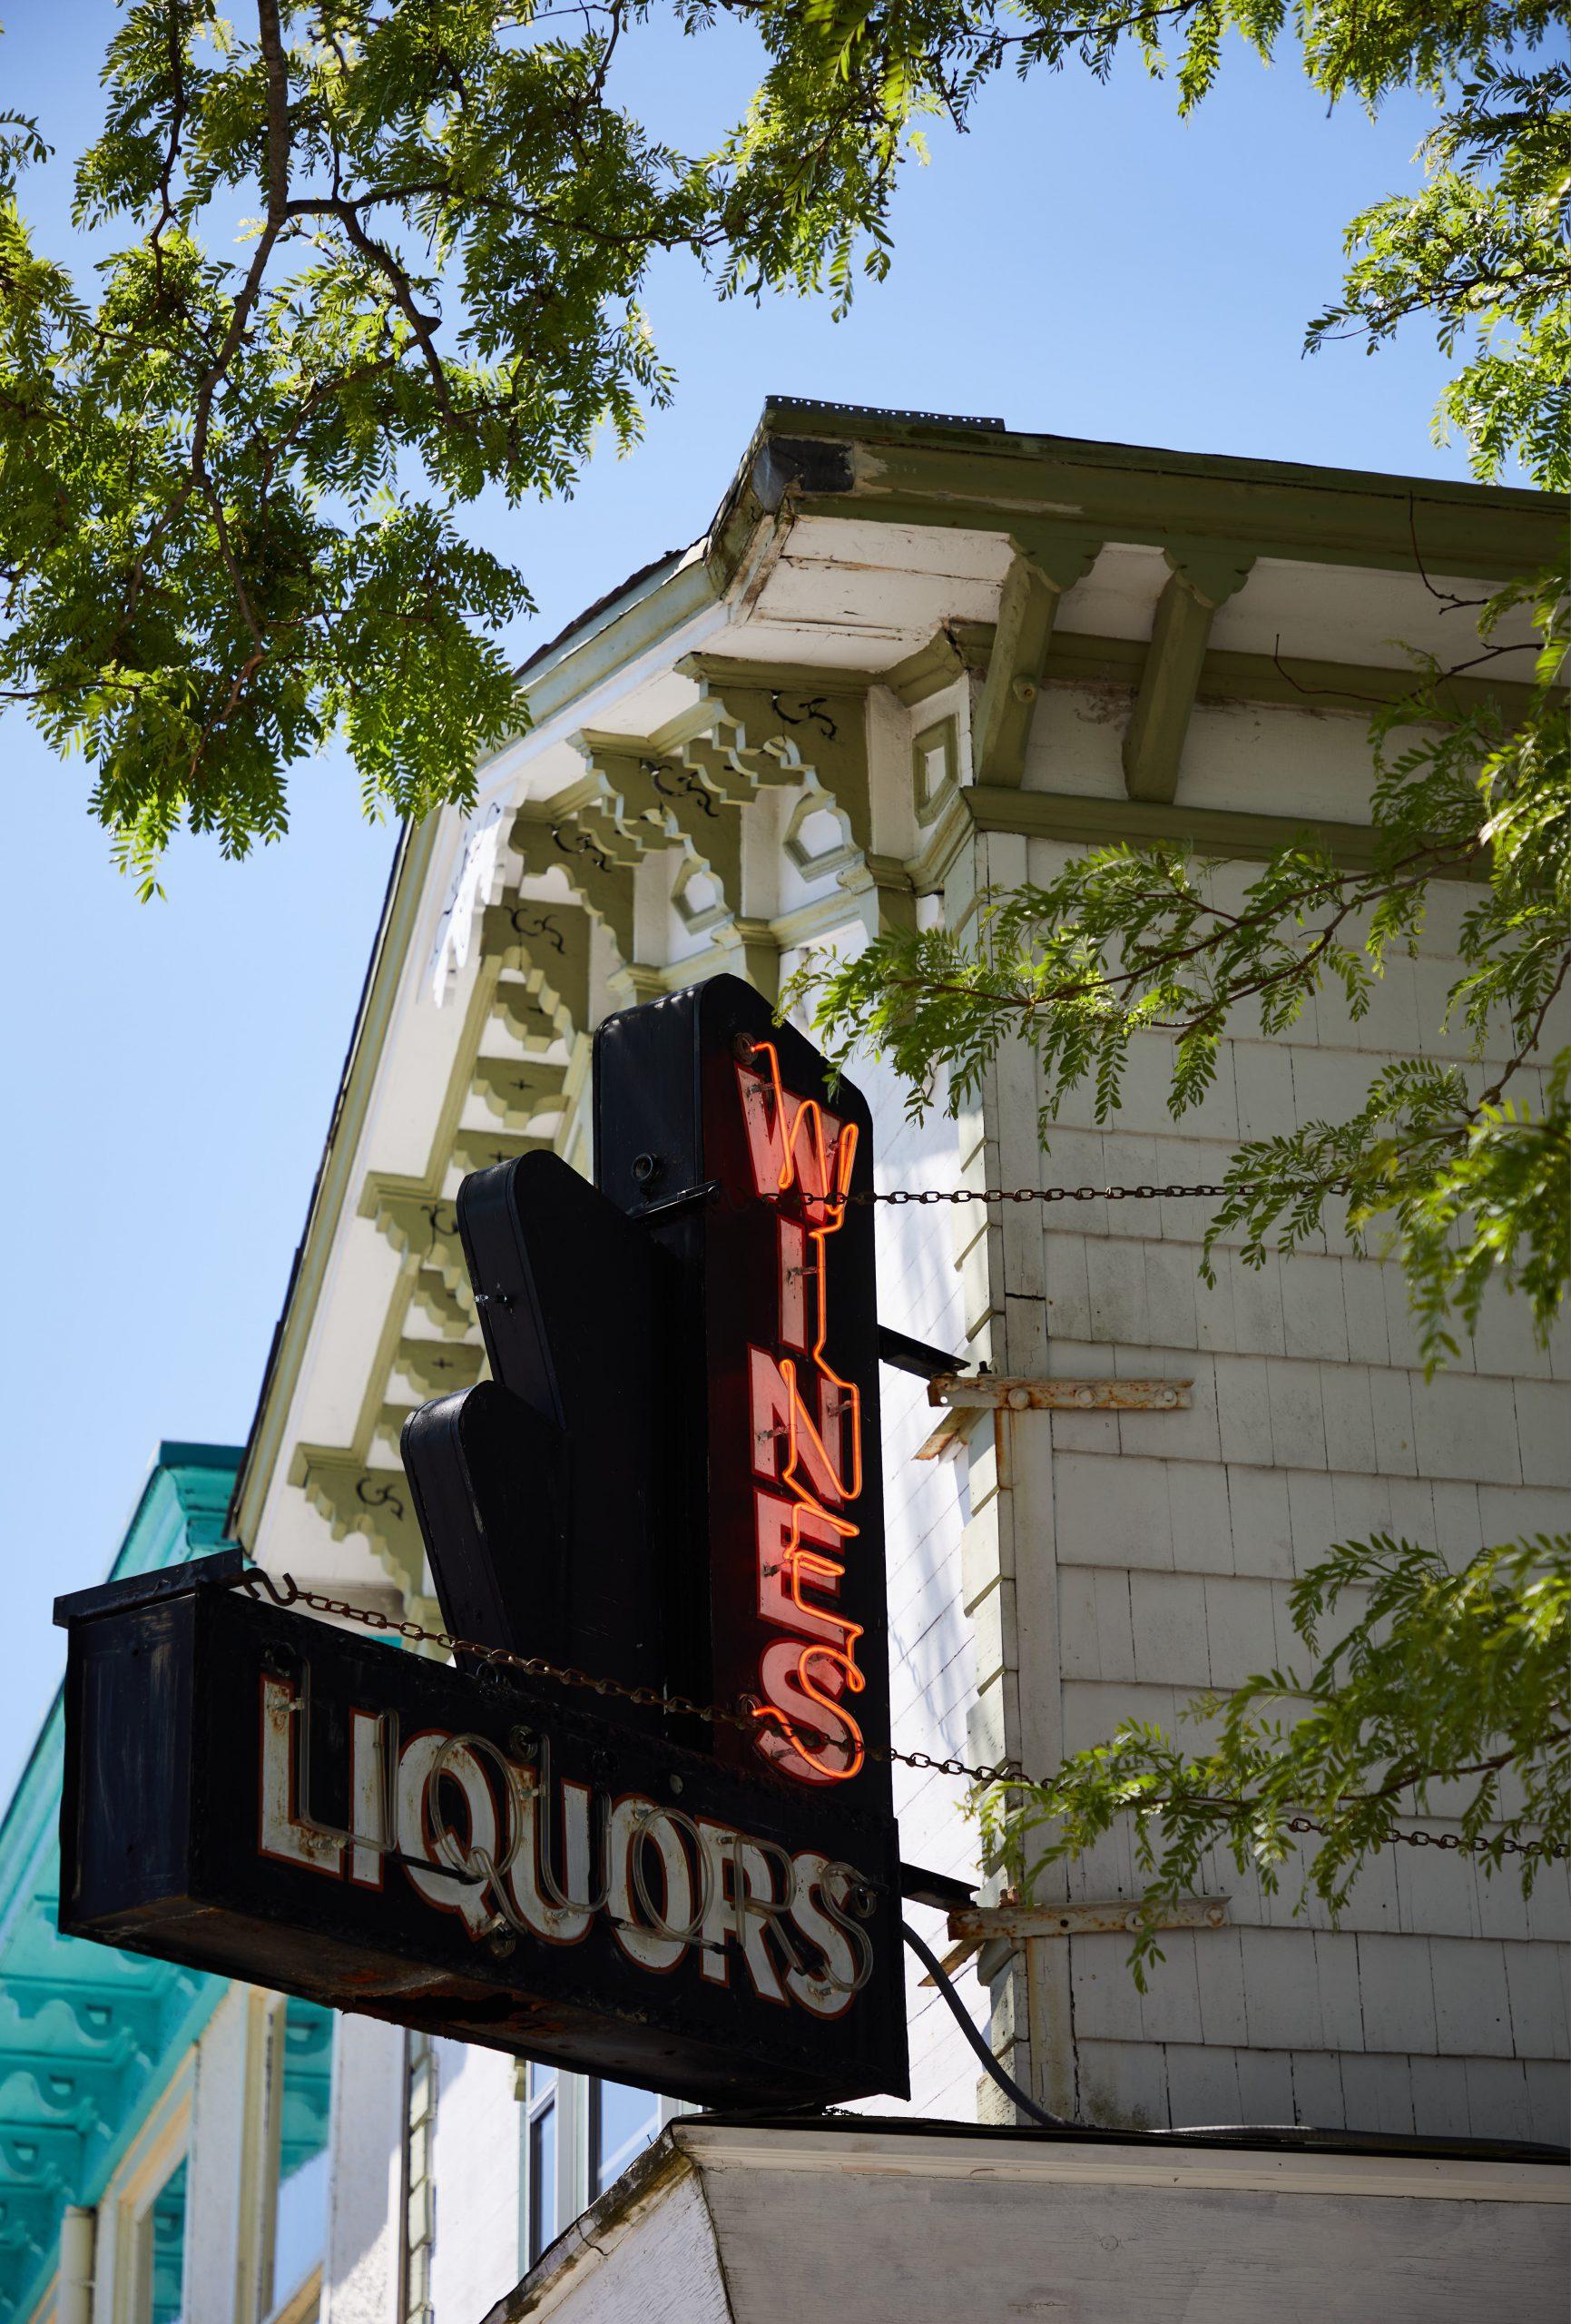 Wines Liquors building sign